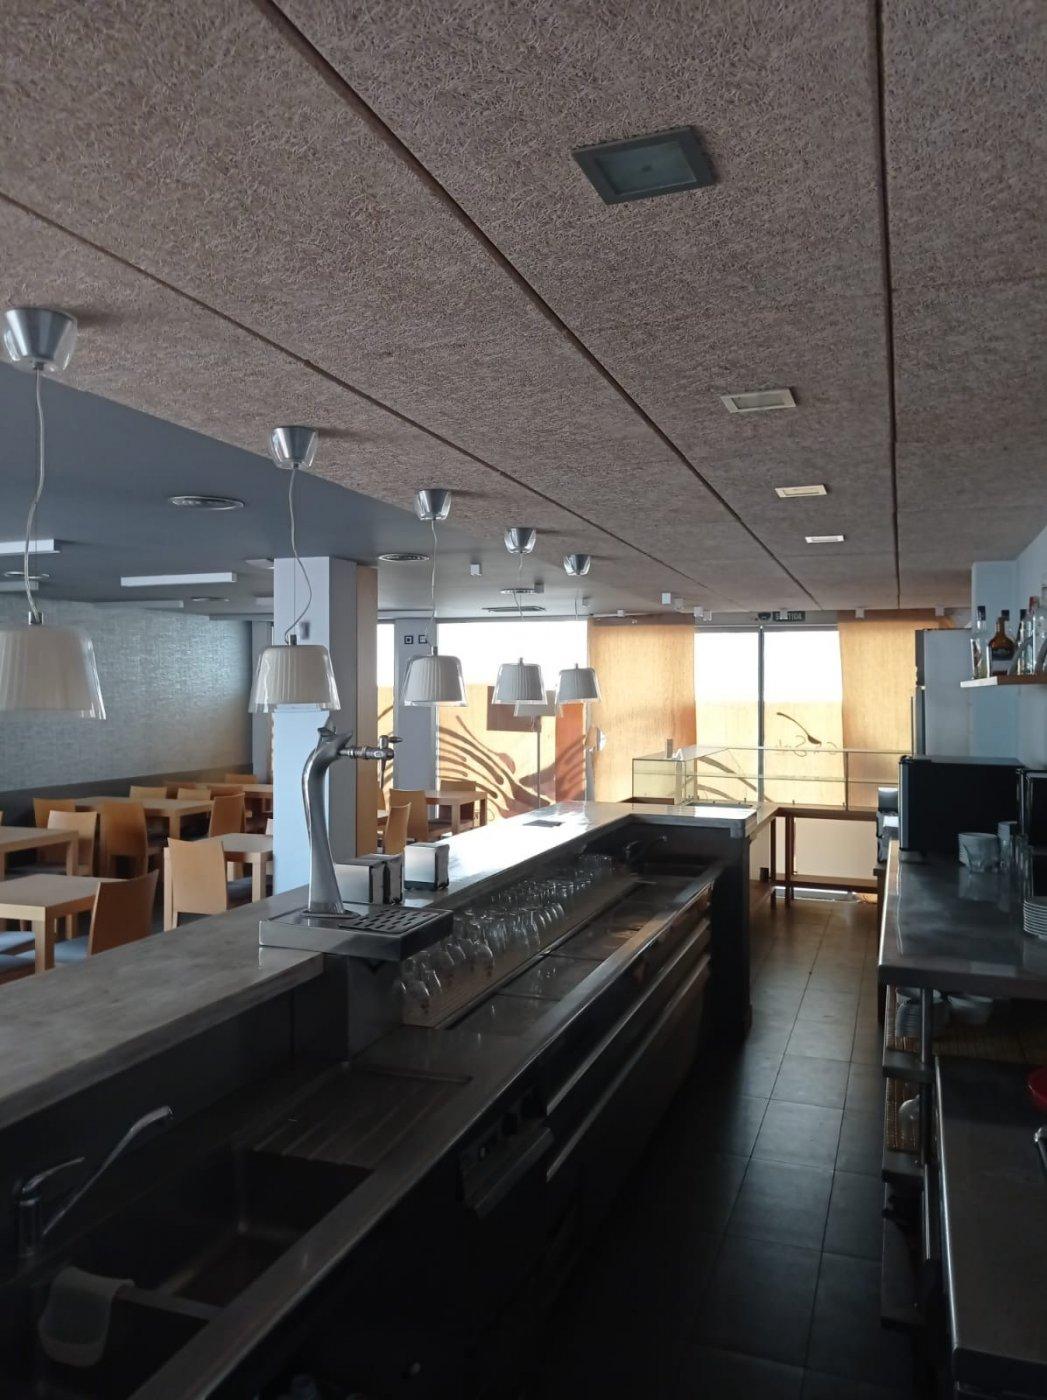 Venta o alquiler con opciÓn a compra de restaurante-bar en el centro de mahÓn totalmente e - imagenInmueble10